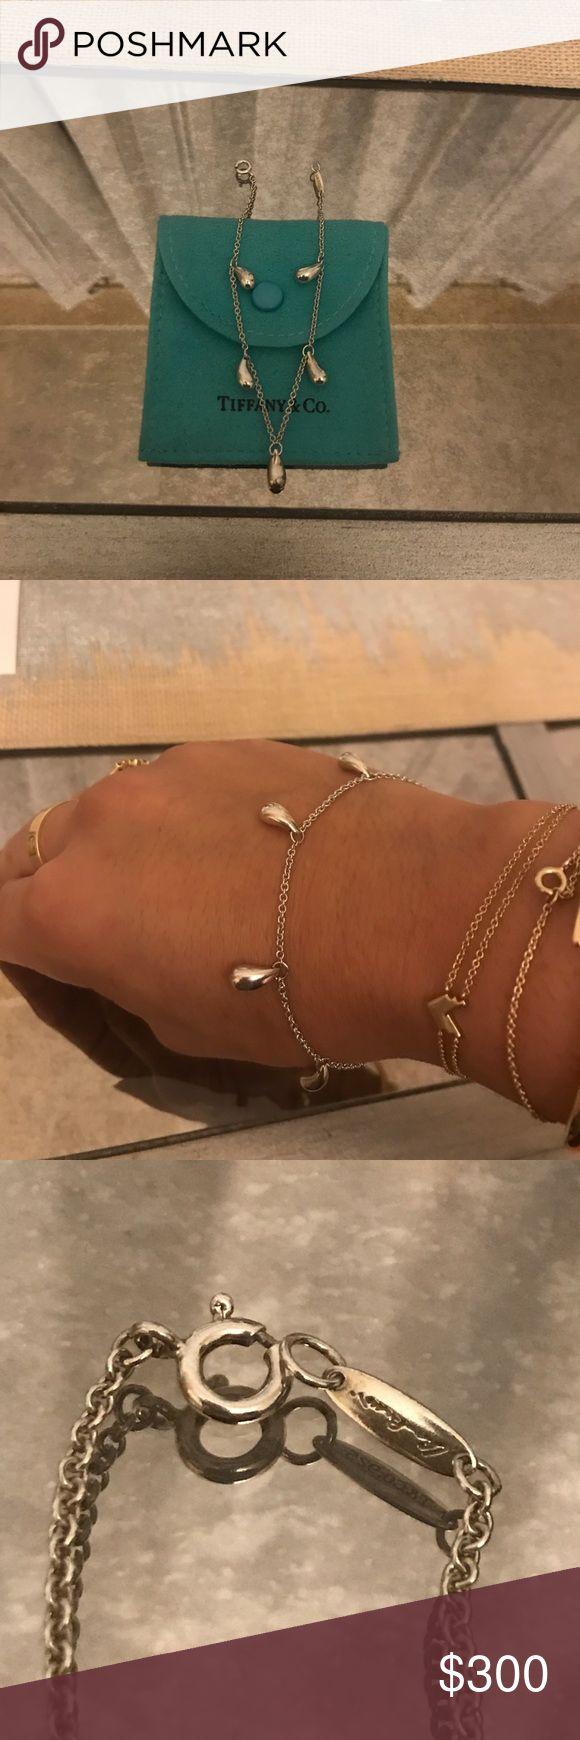 "Tiffany & Co. Elsa Peretti 5 Teardrop bracelet Tiffany & Co. Elsa Peretti 5 Teardrop bracelet Sterling Silver #925. Worn a few times. Great condition. Pouch included. Measures about 7.5"" Tiffany & Co. Jewelry Bracelets"